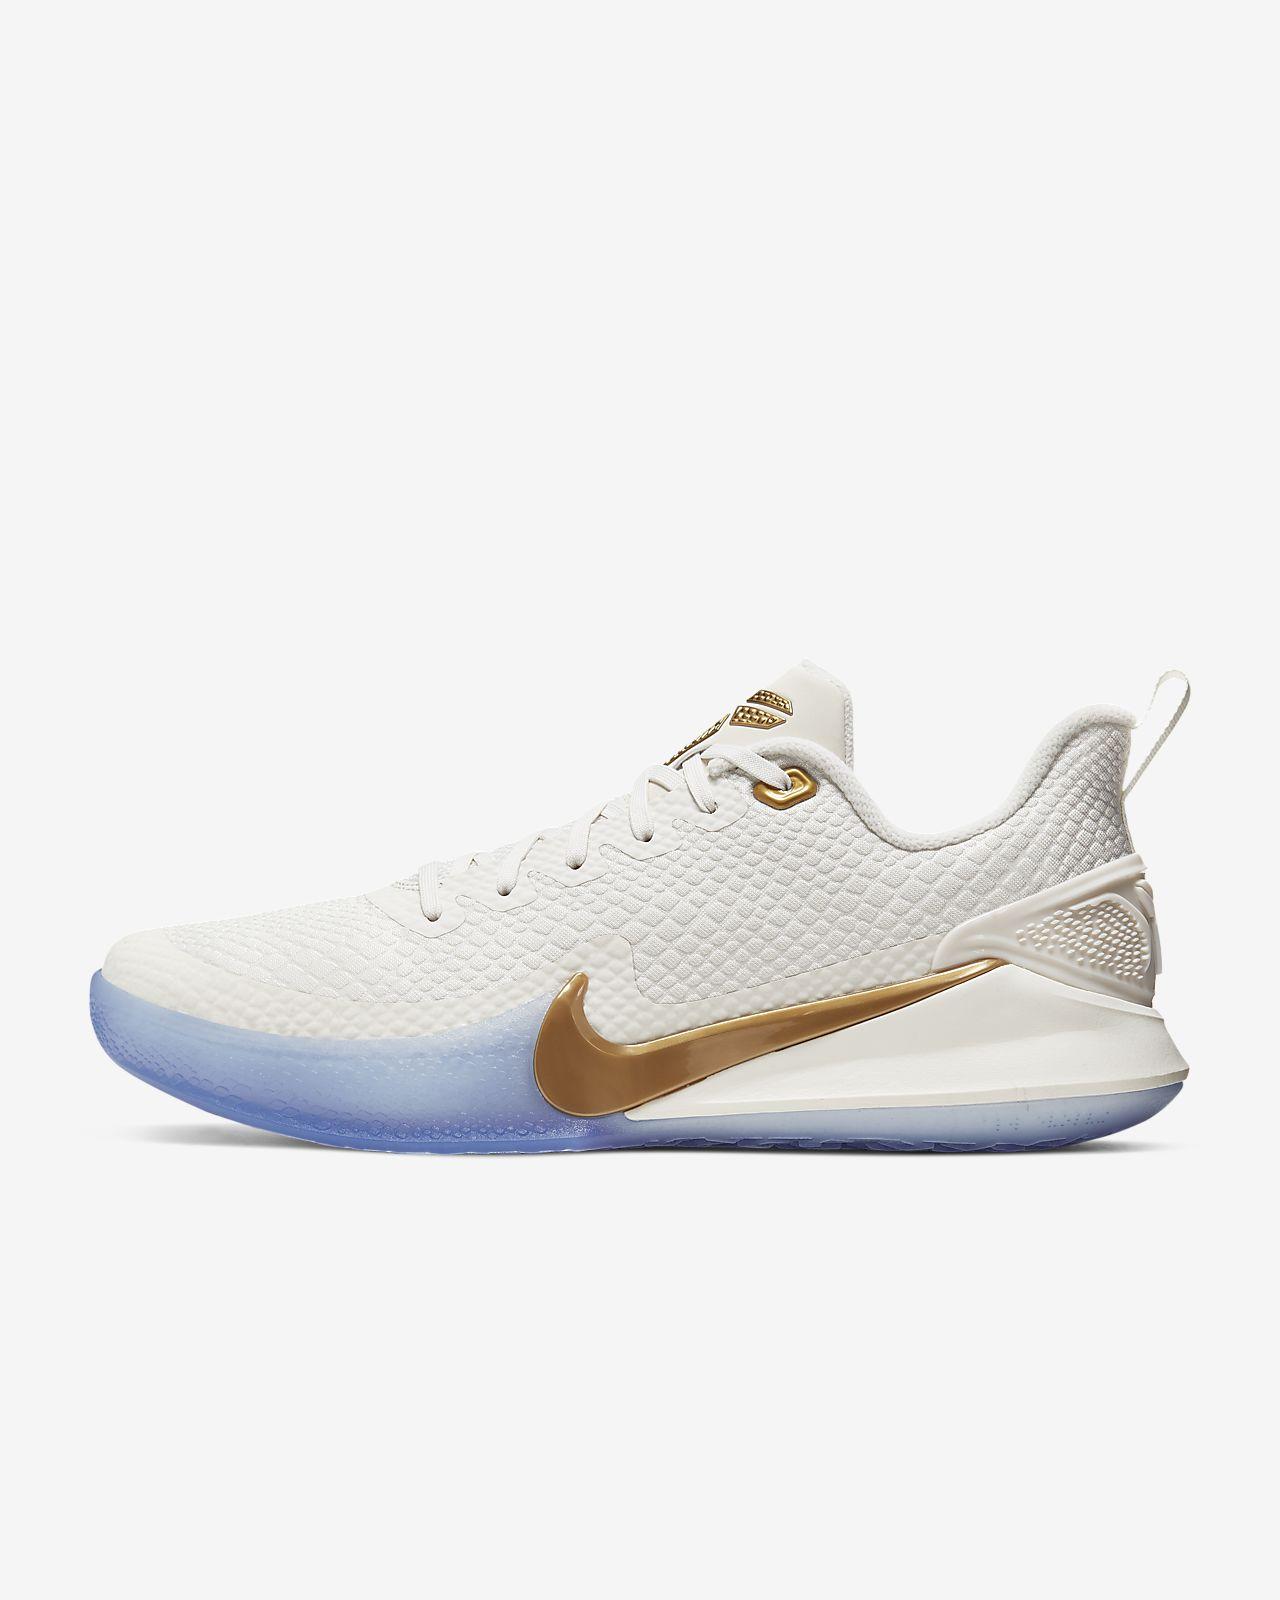 Mamba Focus Basketball Shoe